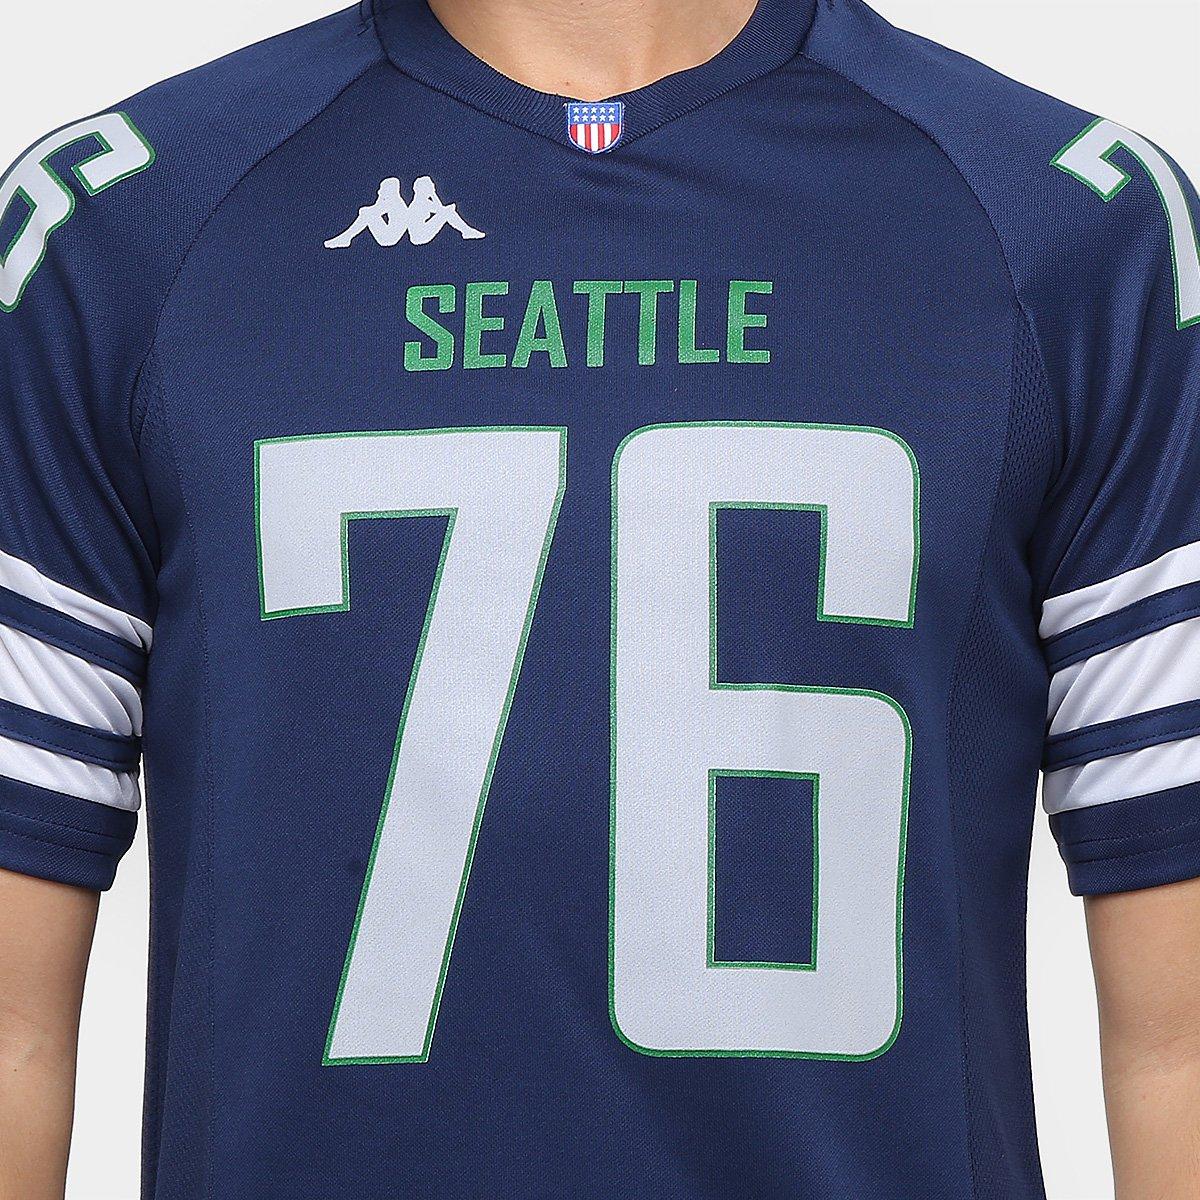 Camiseta Seattle Kappa Futebol Americano Masculina - Compre Agora ... 69595f84769fc